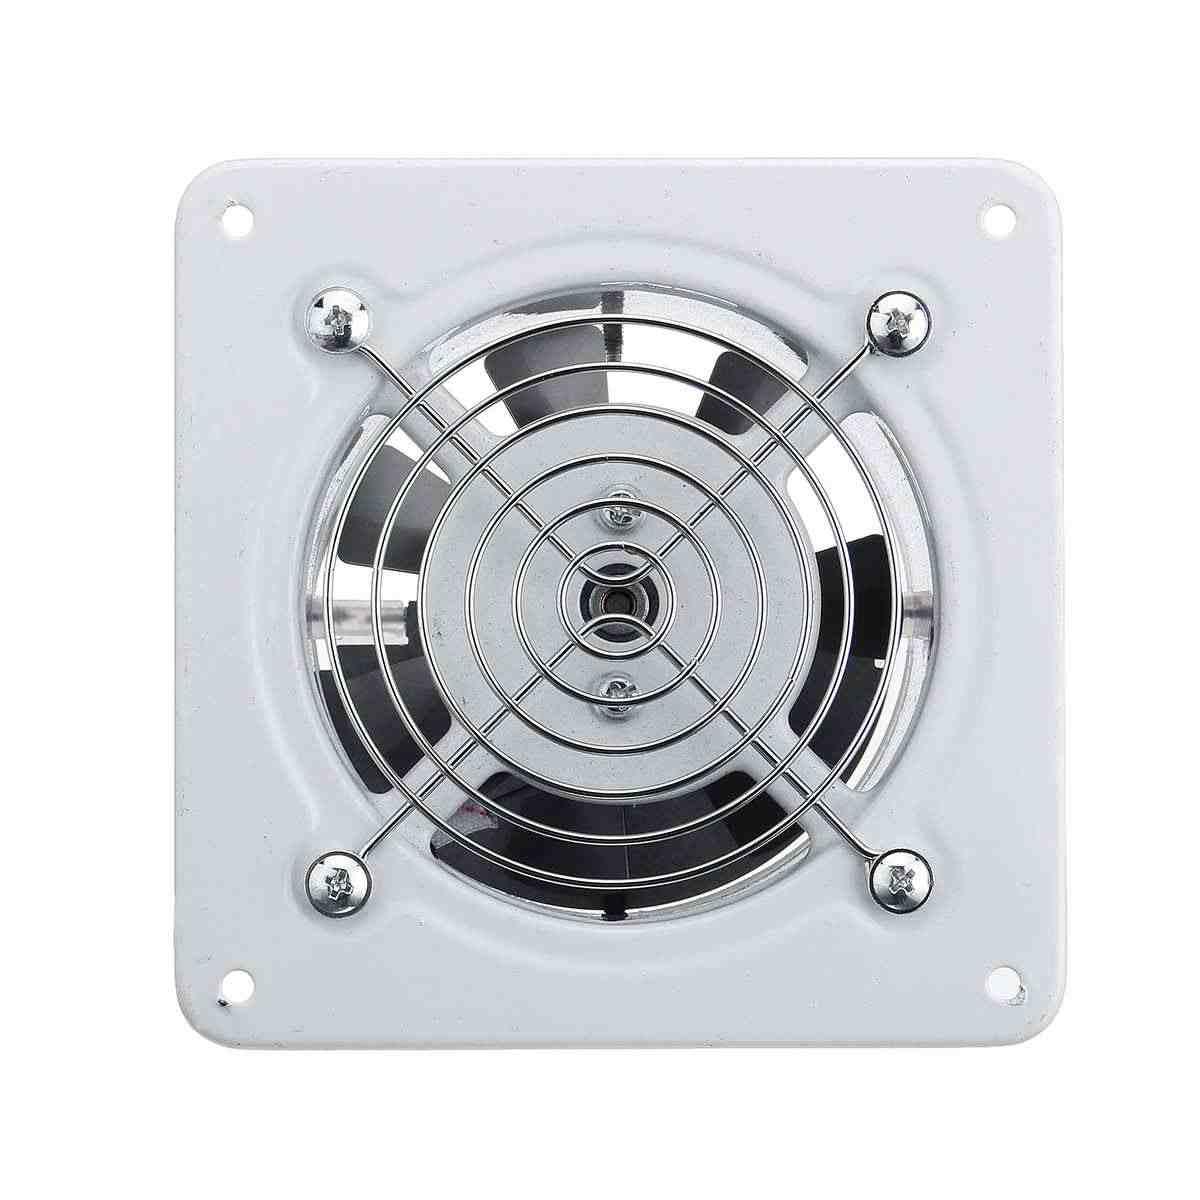 25 W 4 ''220 V Hause Bad Küche Wc Geräuscharm Ventilator Air Vents Auspuff Fan Wand Fenster Extractor belüftung Fan